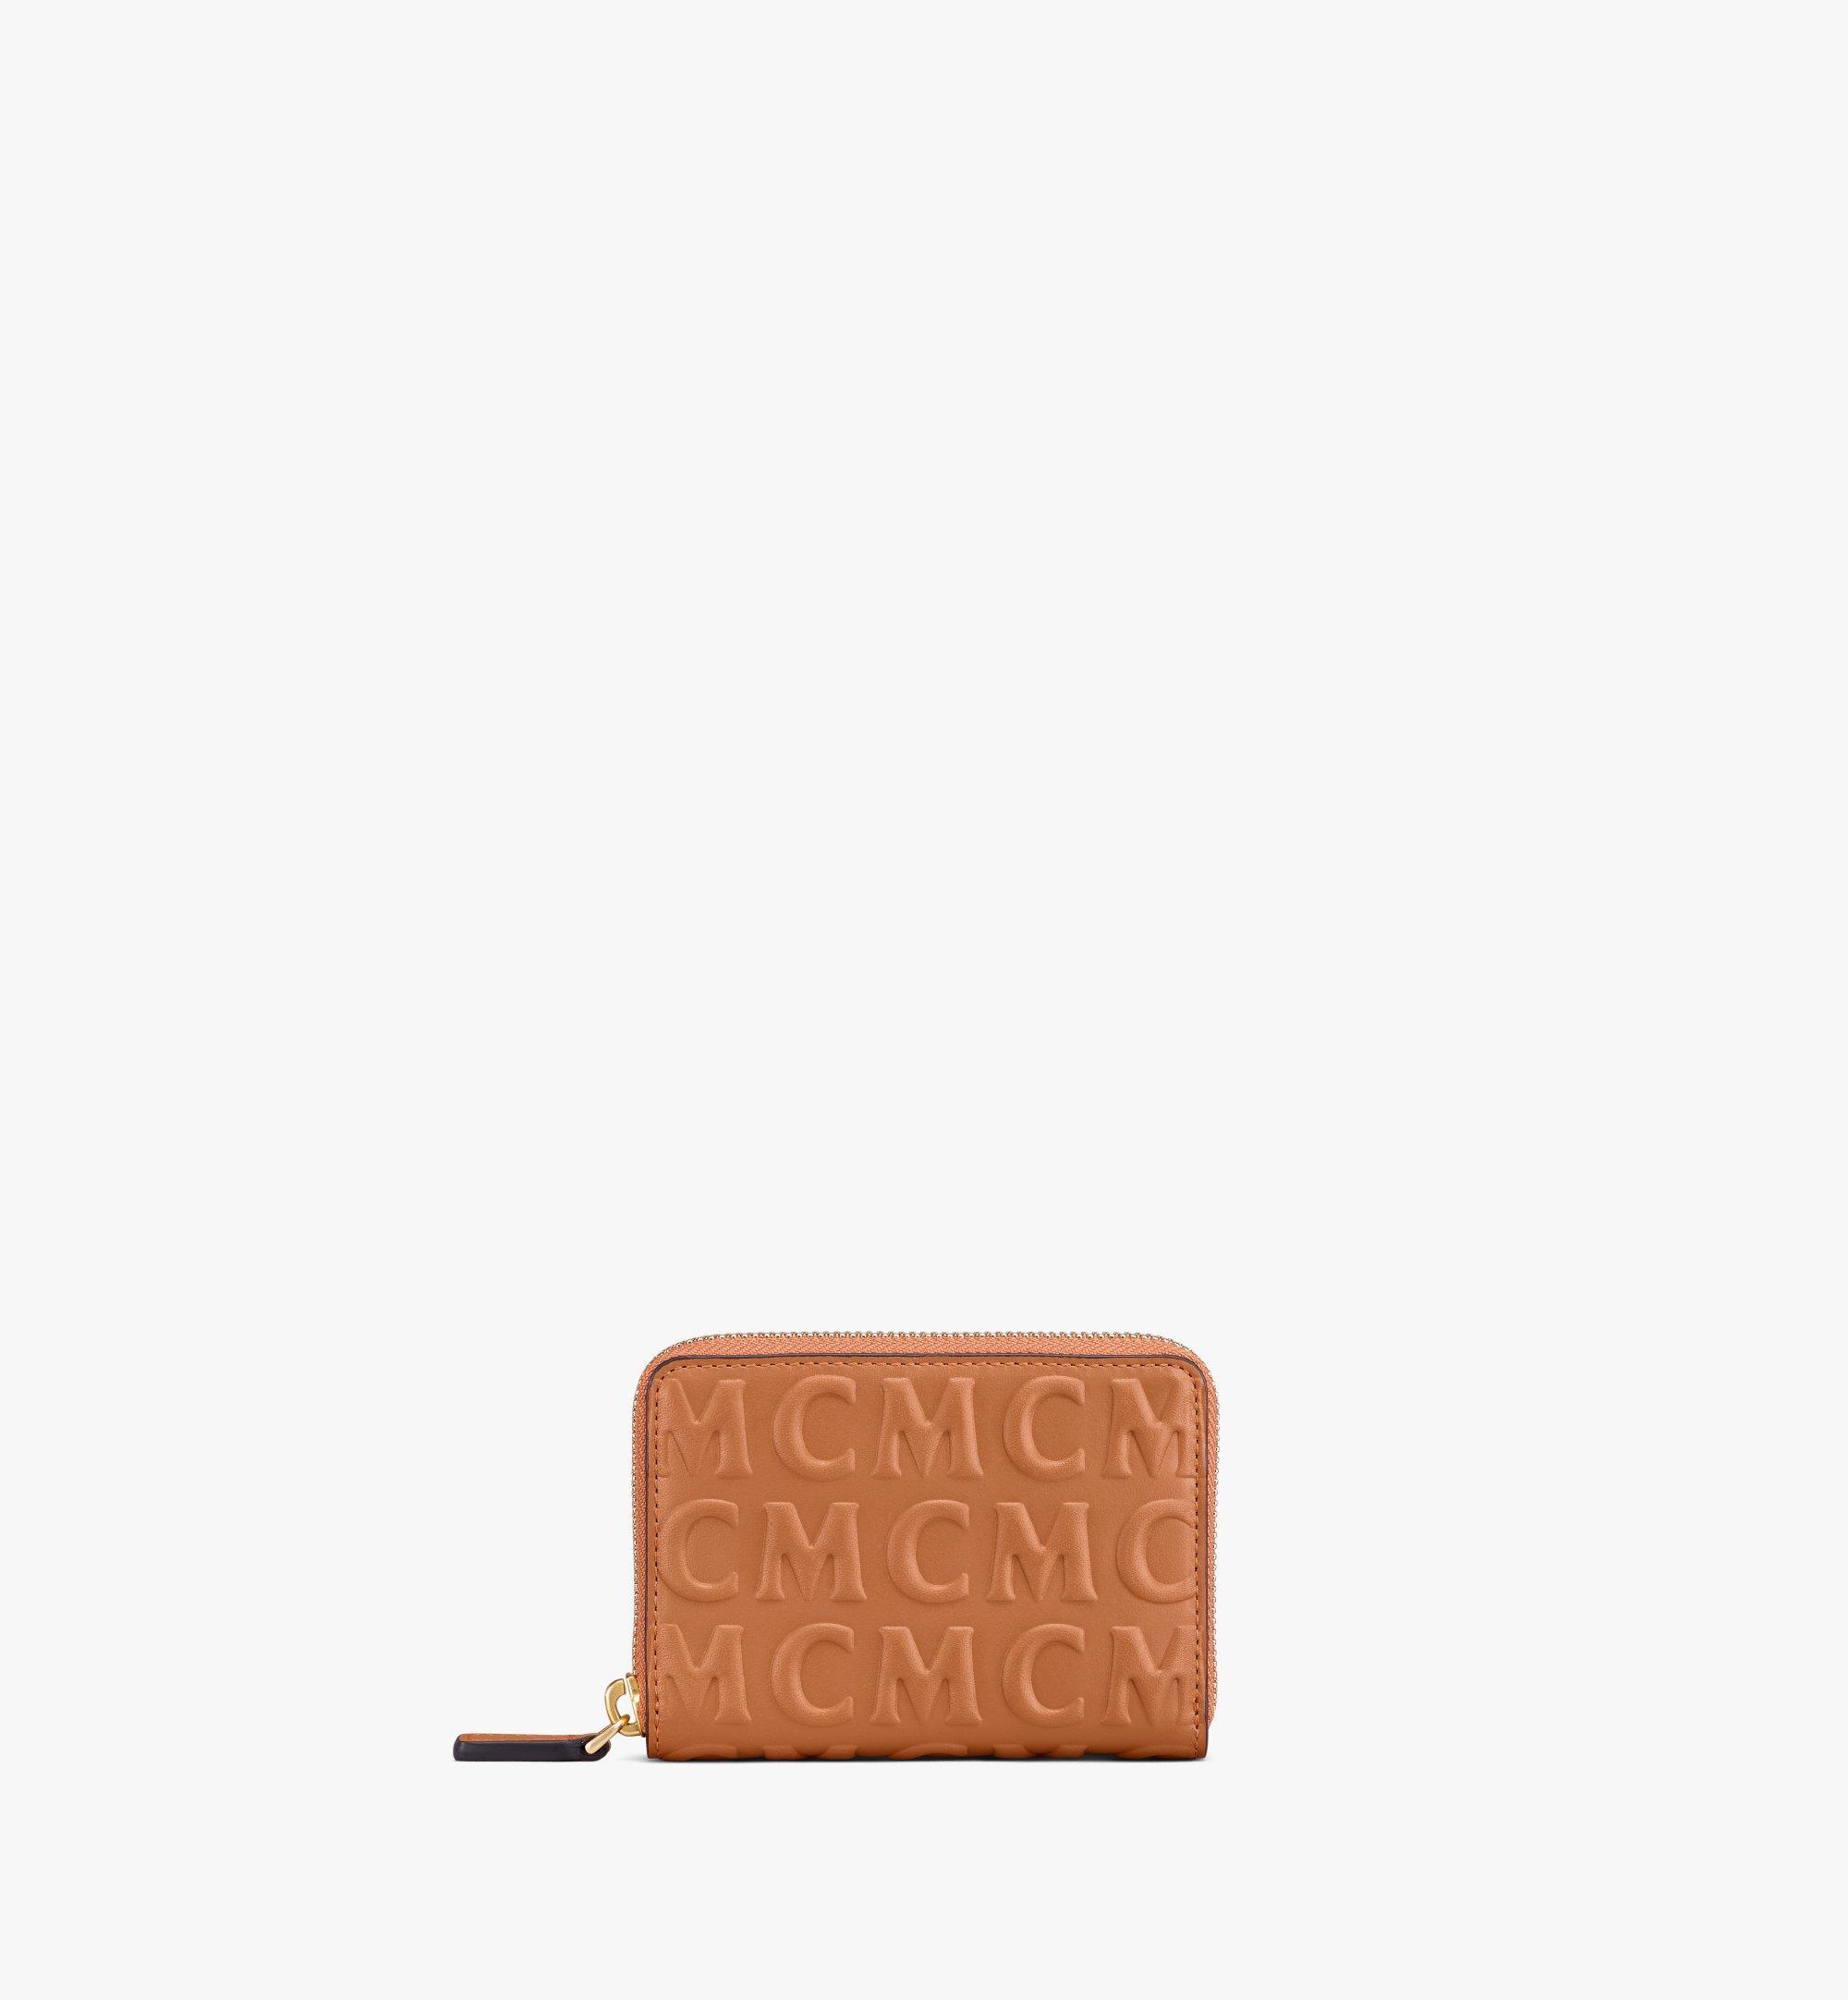 MCM Zip Around Wallet in MCM Monogram Leather Cognac MYLAAMD02CO001 Alternate View 1